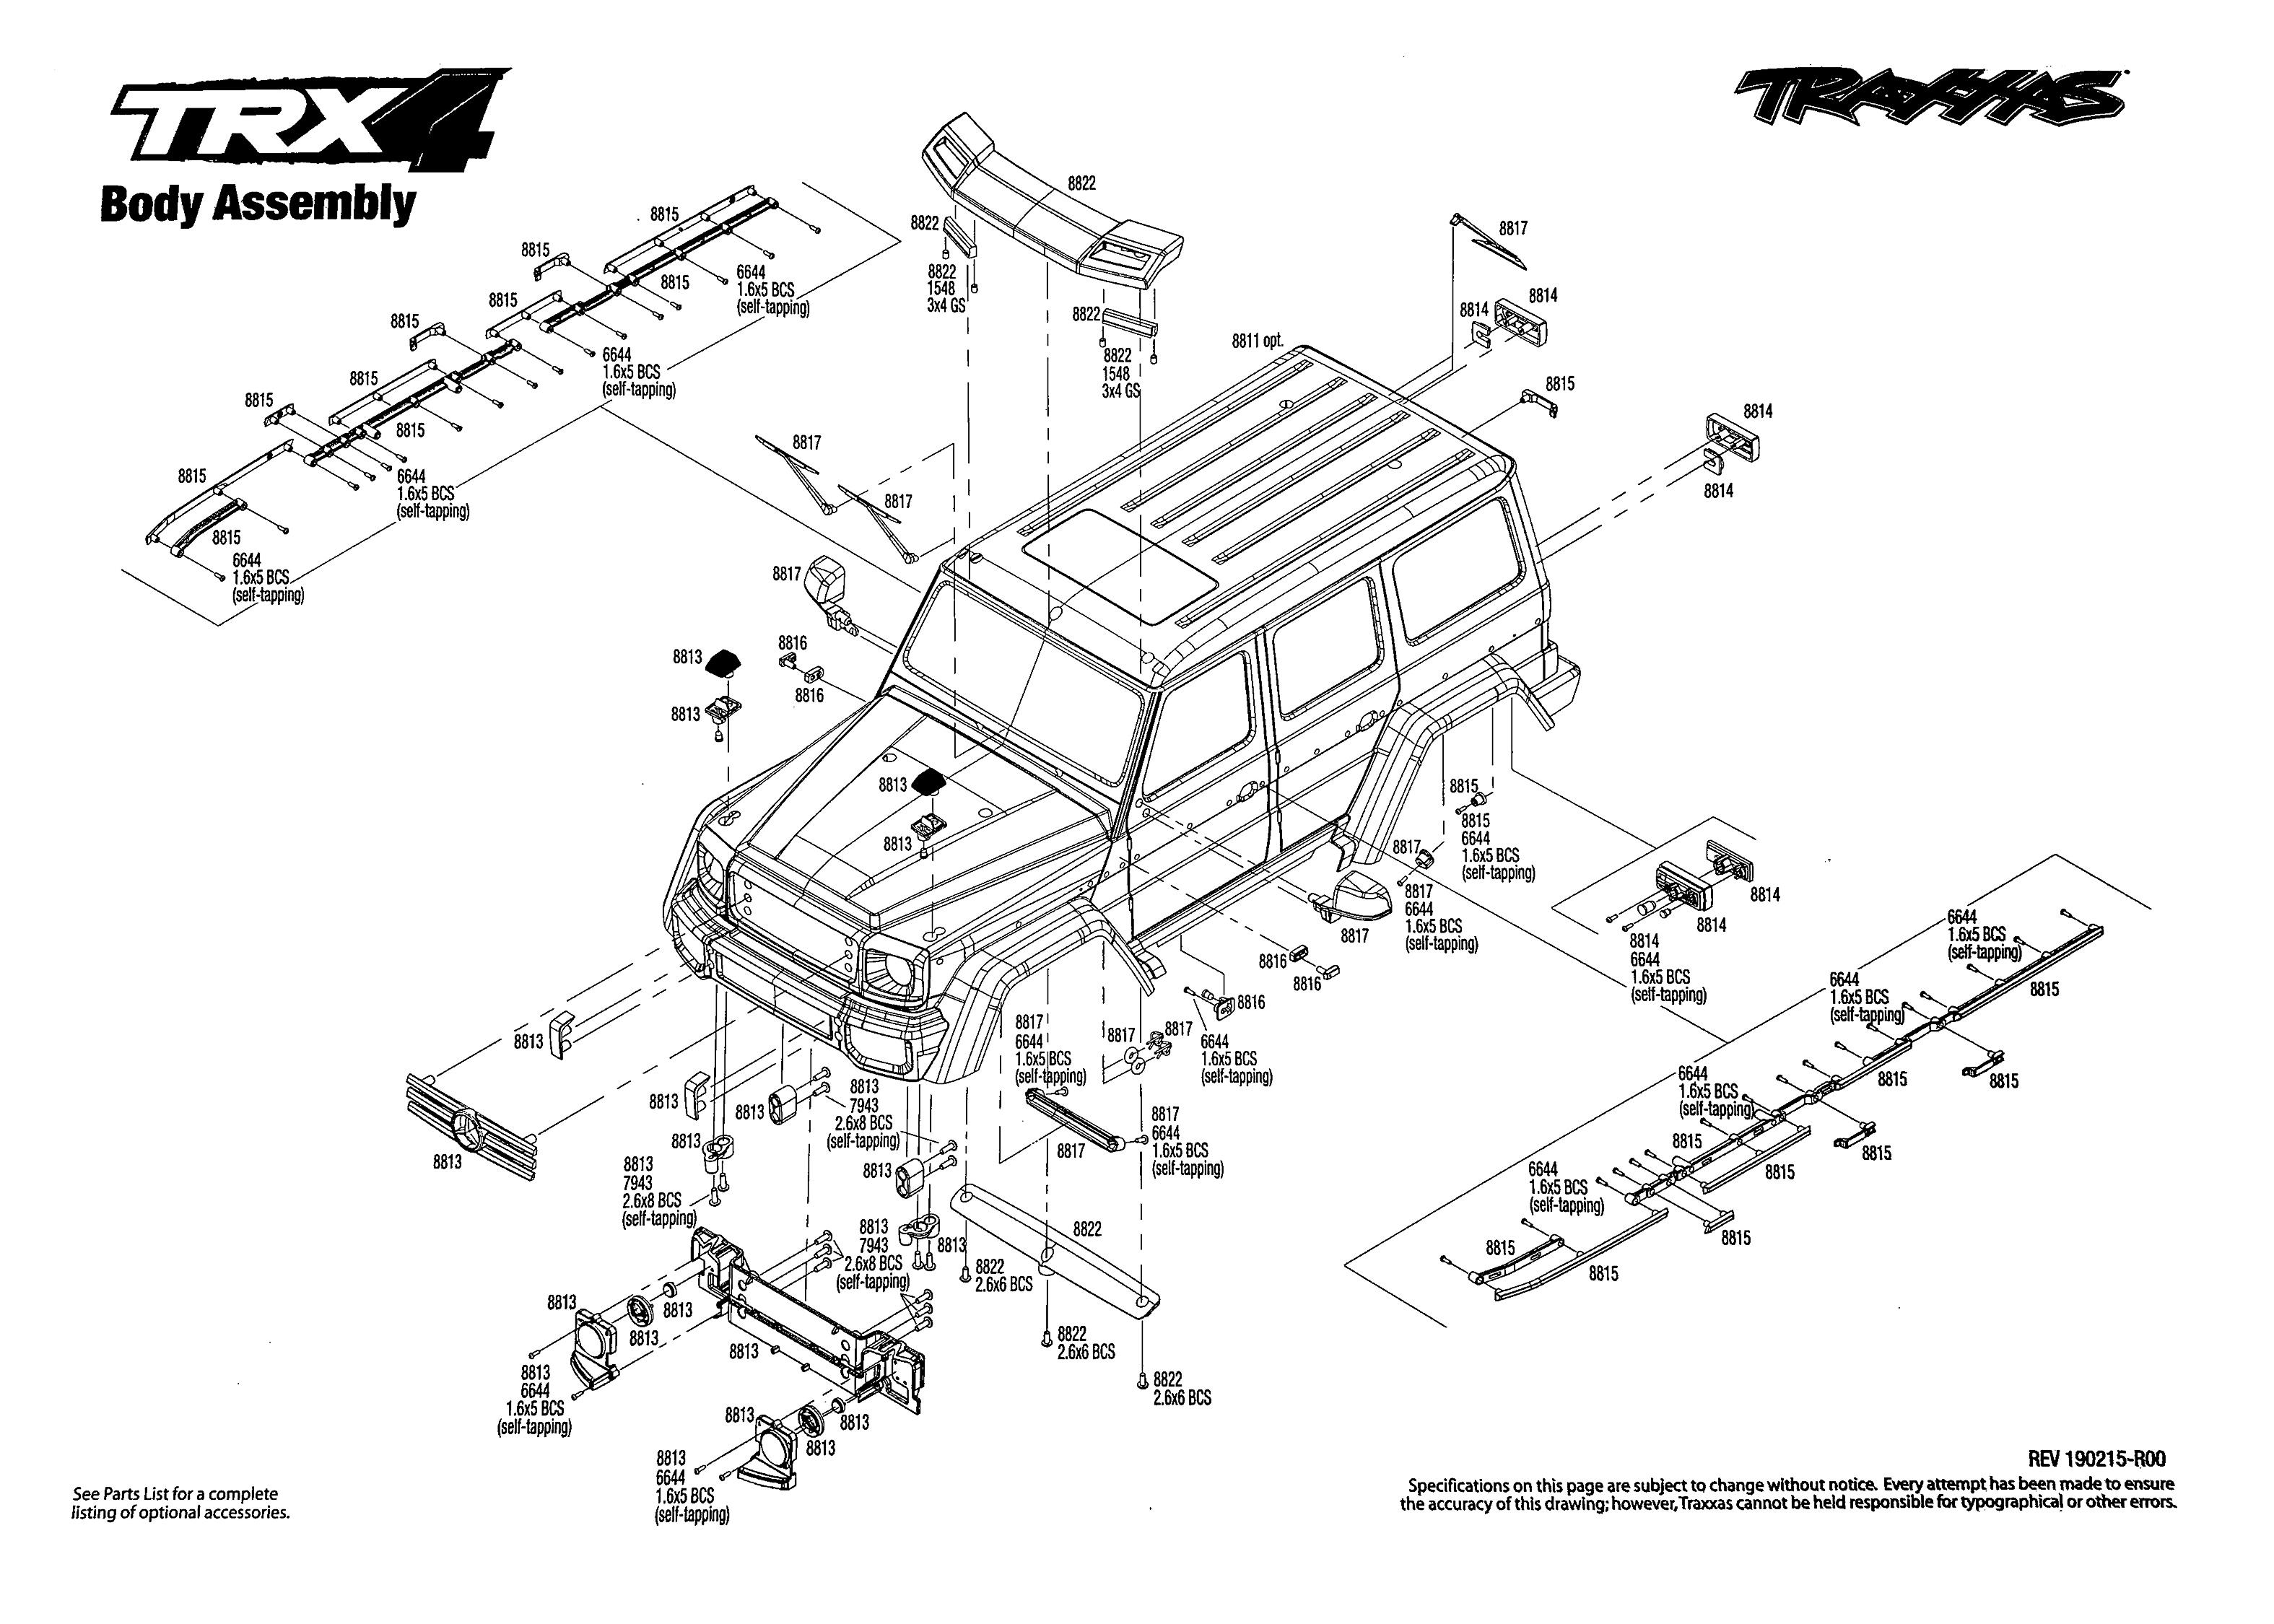 Exploded view: Traxxas TRX-4 Mercedes G500 1:10 TQi RTR